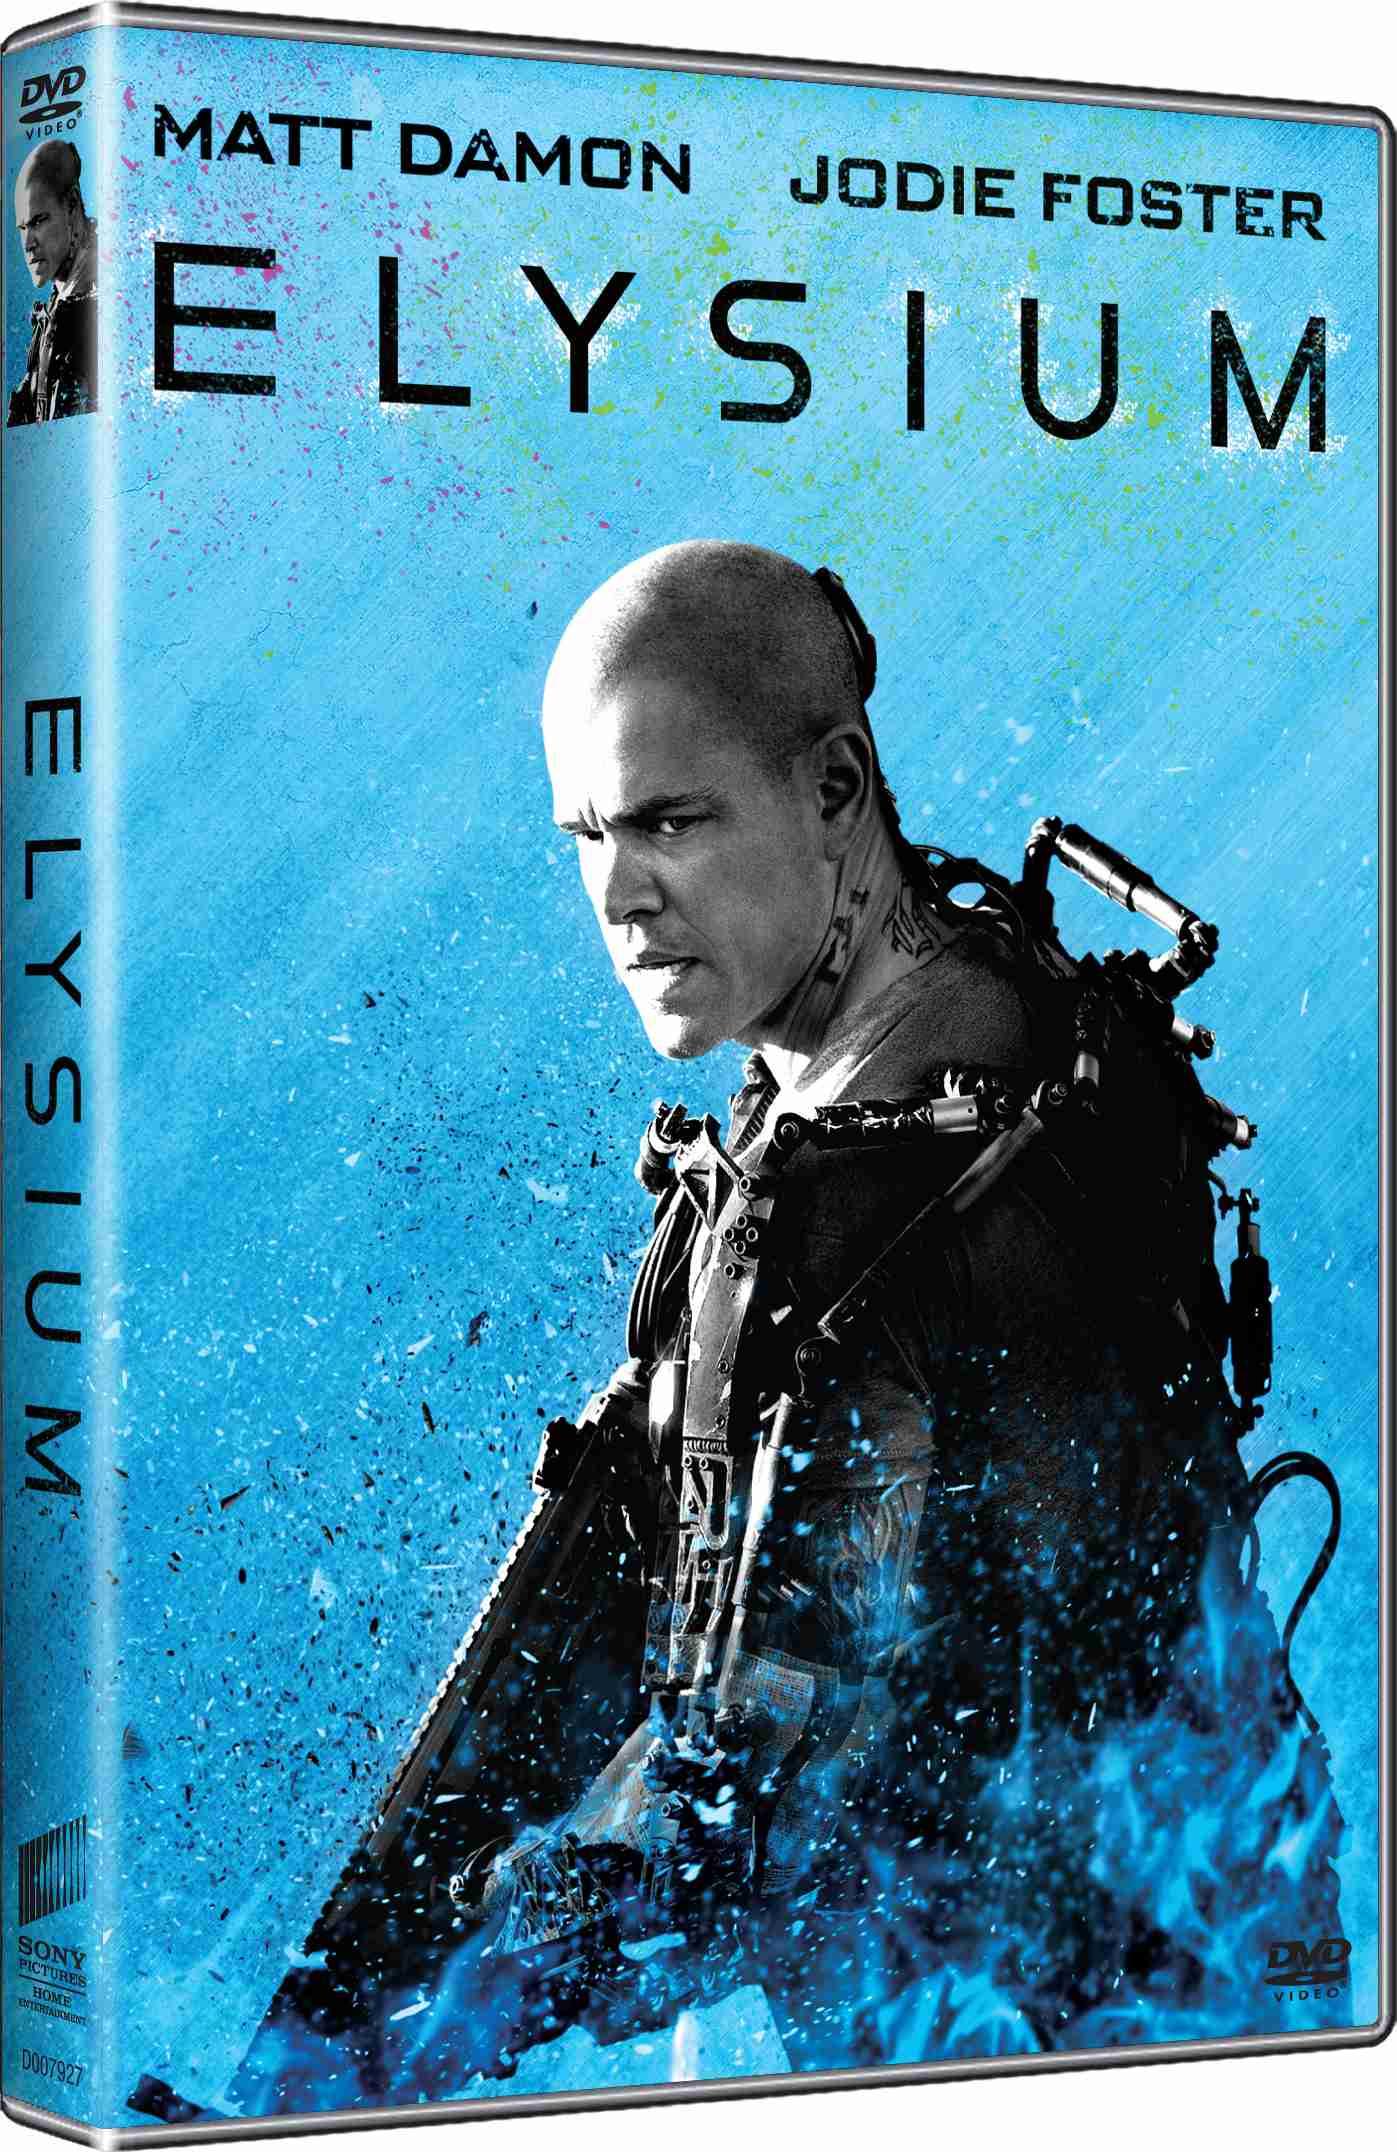 ELYSIUM (Big Face) - DVD